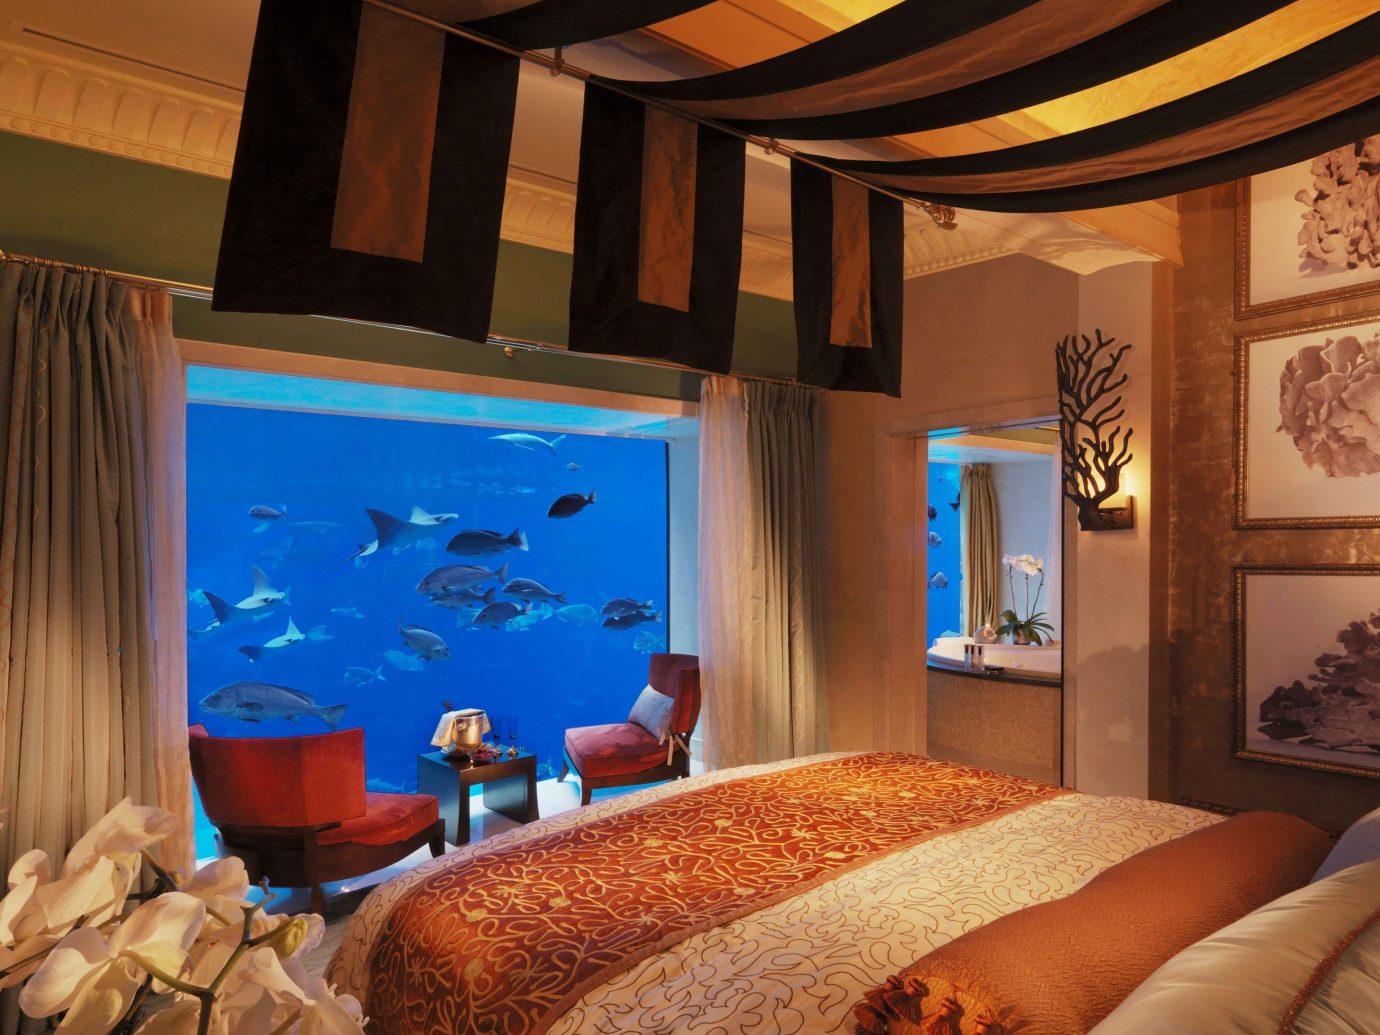 Scuba Diving + Snorkeling Trip Ideas indoor room property estate Suite living room interior design Resort Bedroom home cottage